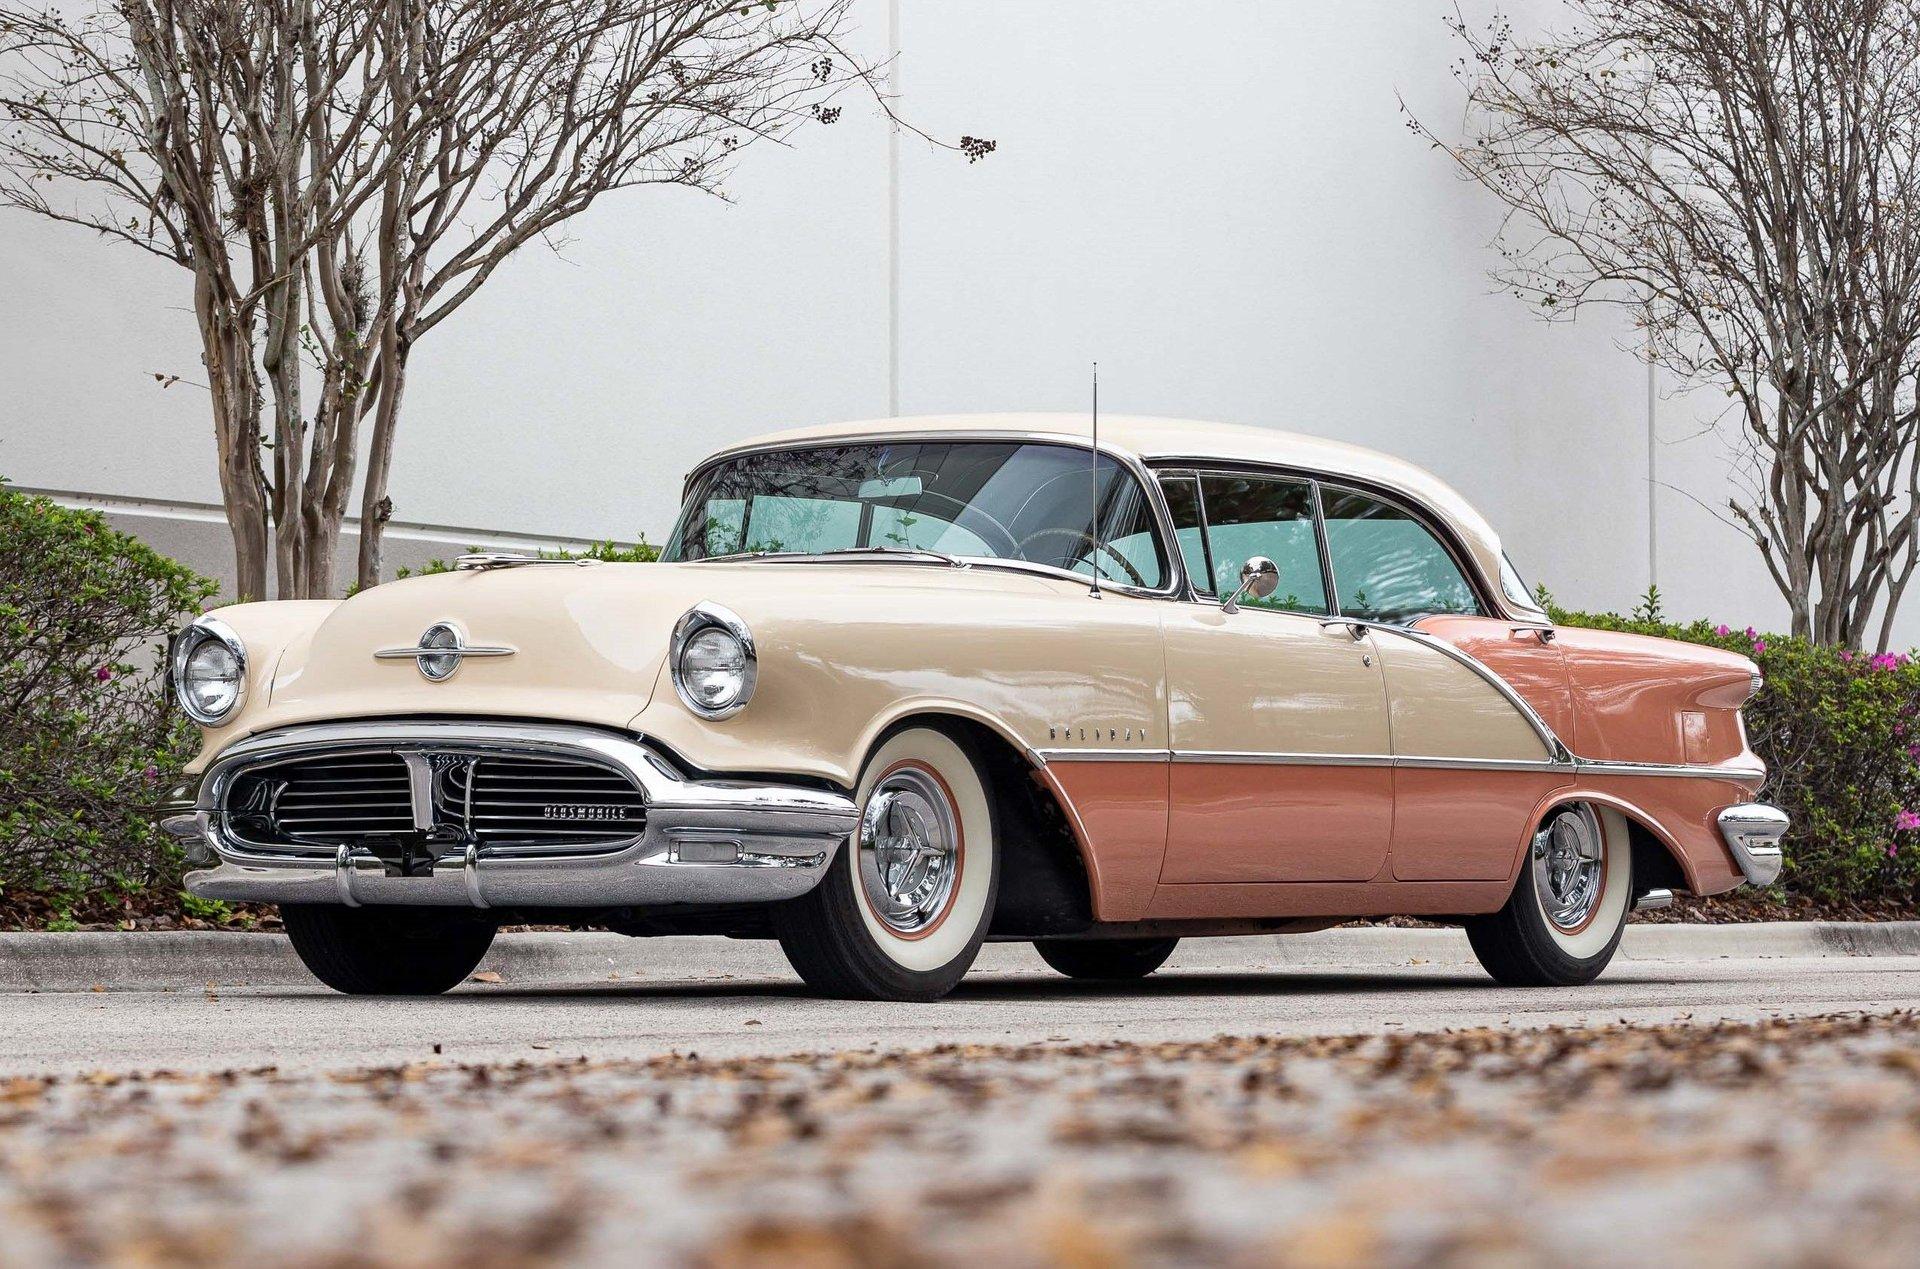 1956 oldsmobile super 88 hardtop